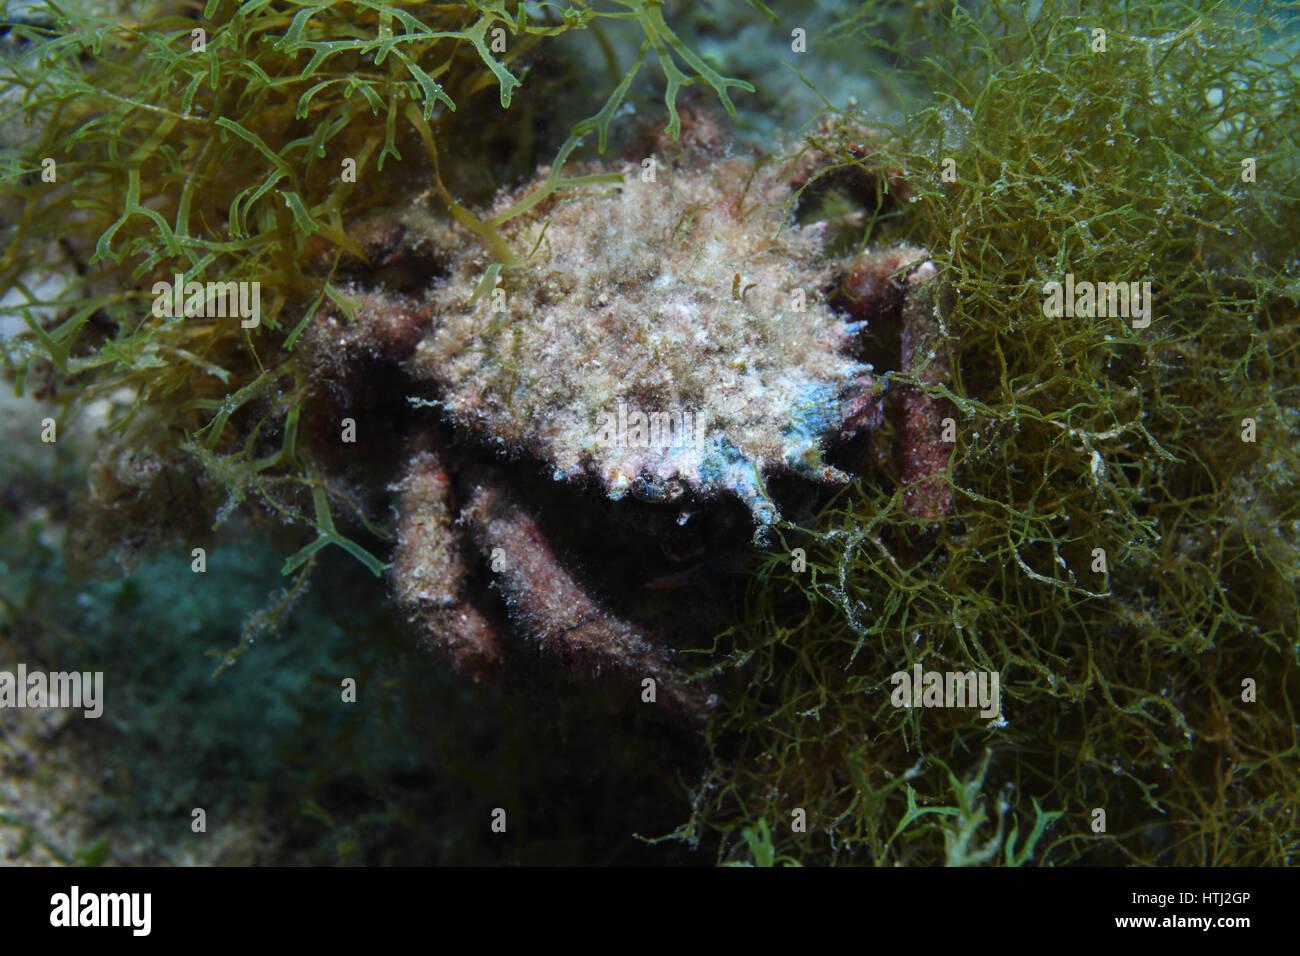 European spider crab (Maja squinado) underwater in the Mediterranean Sea - Stock Image